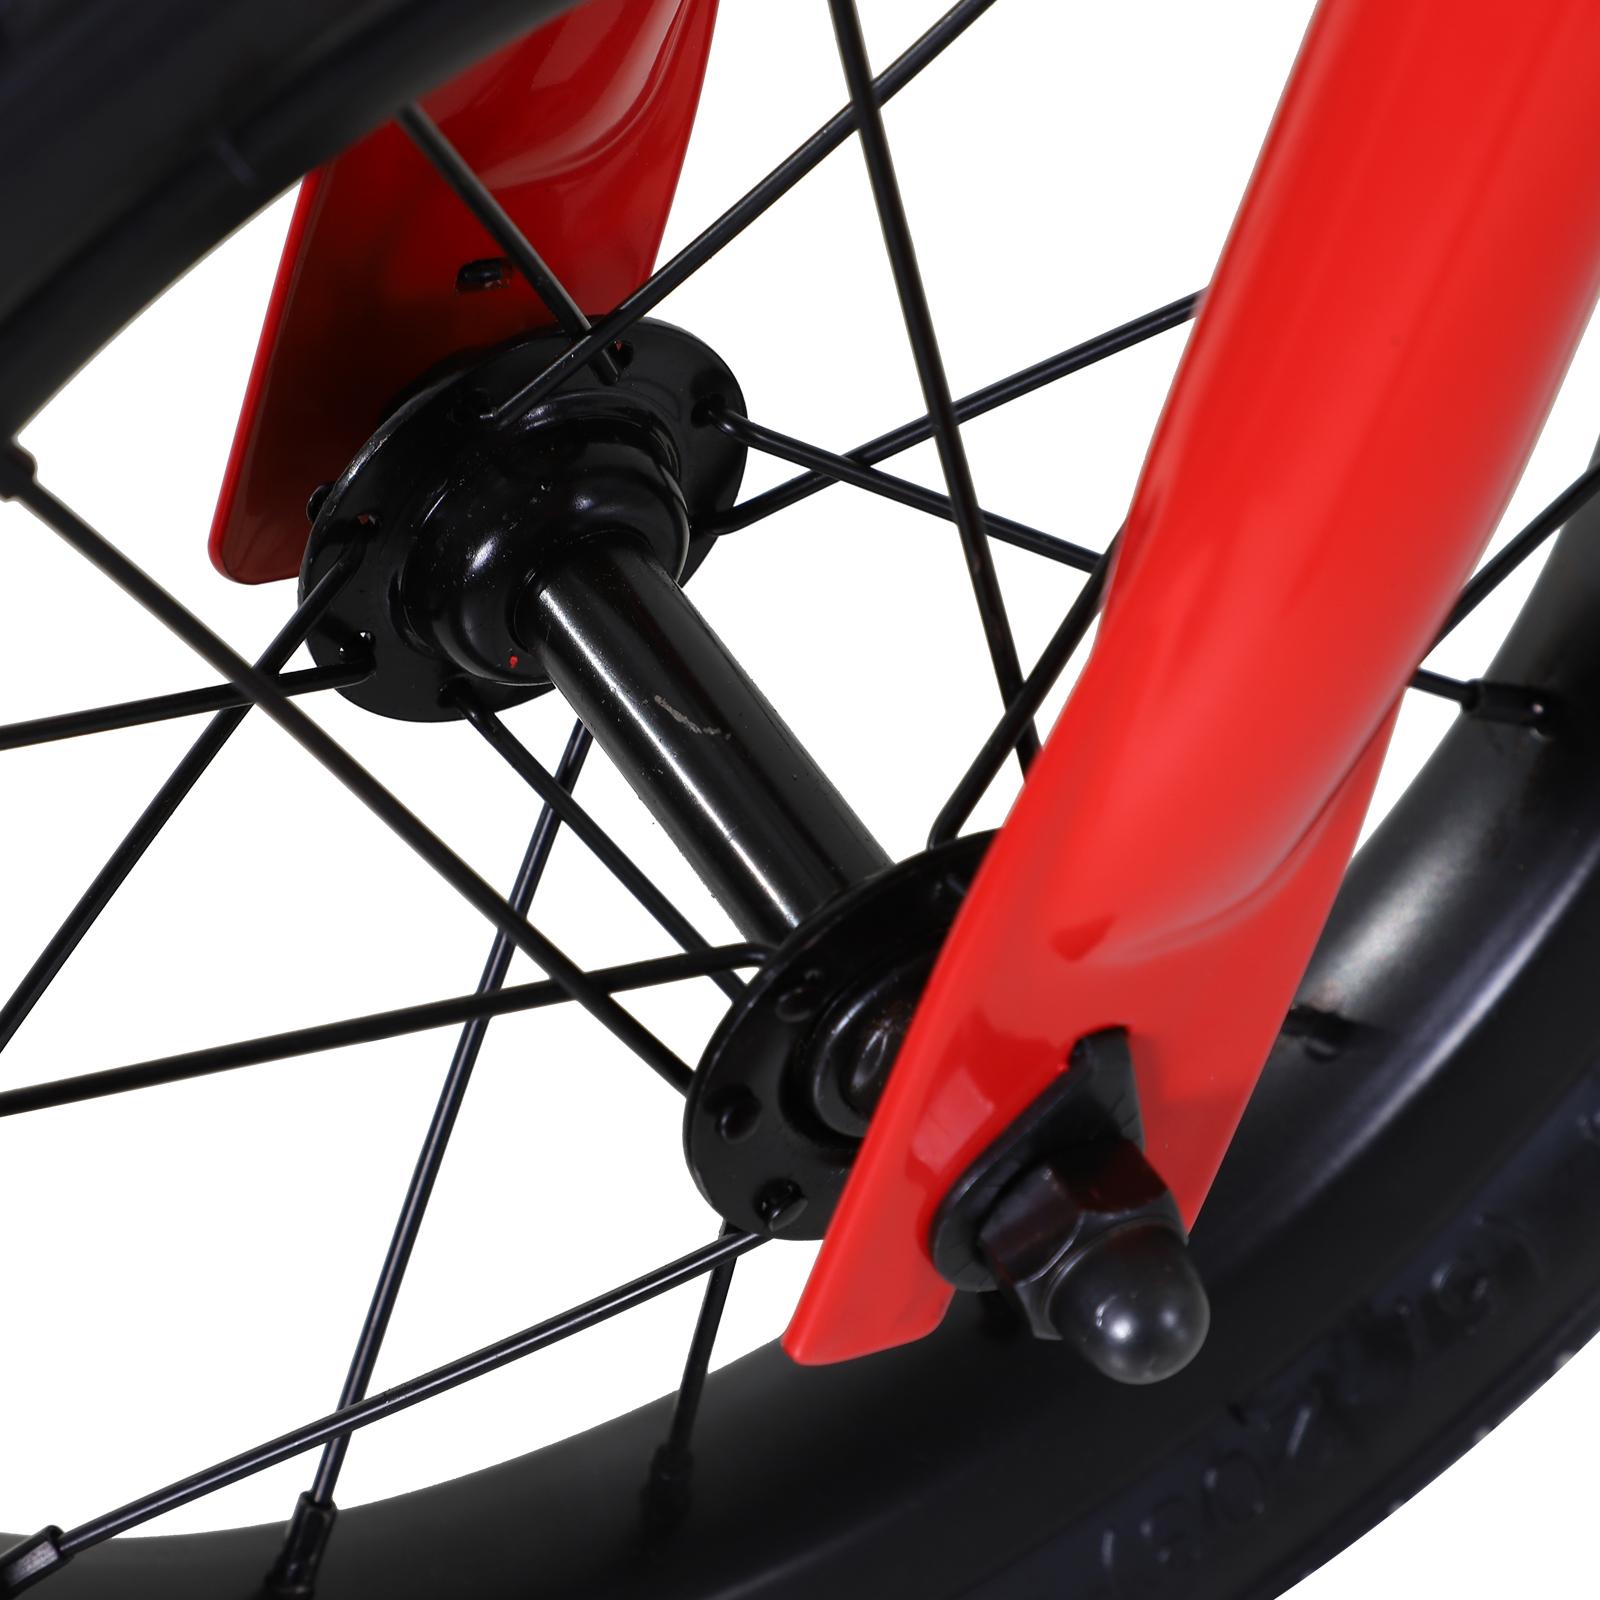 Bicicleta-sin-Pedales-de-Altura-de-Asiento-Regulable-31-45cm-2-5-Anos miniatura 25